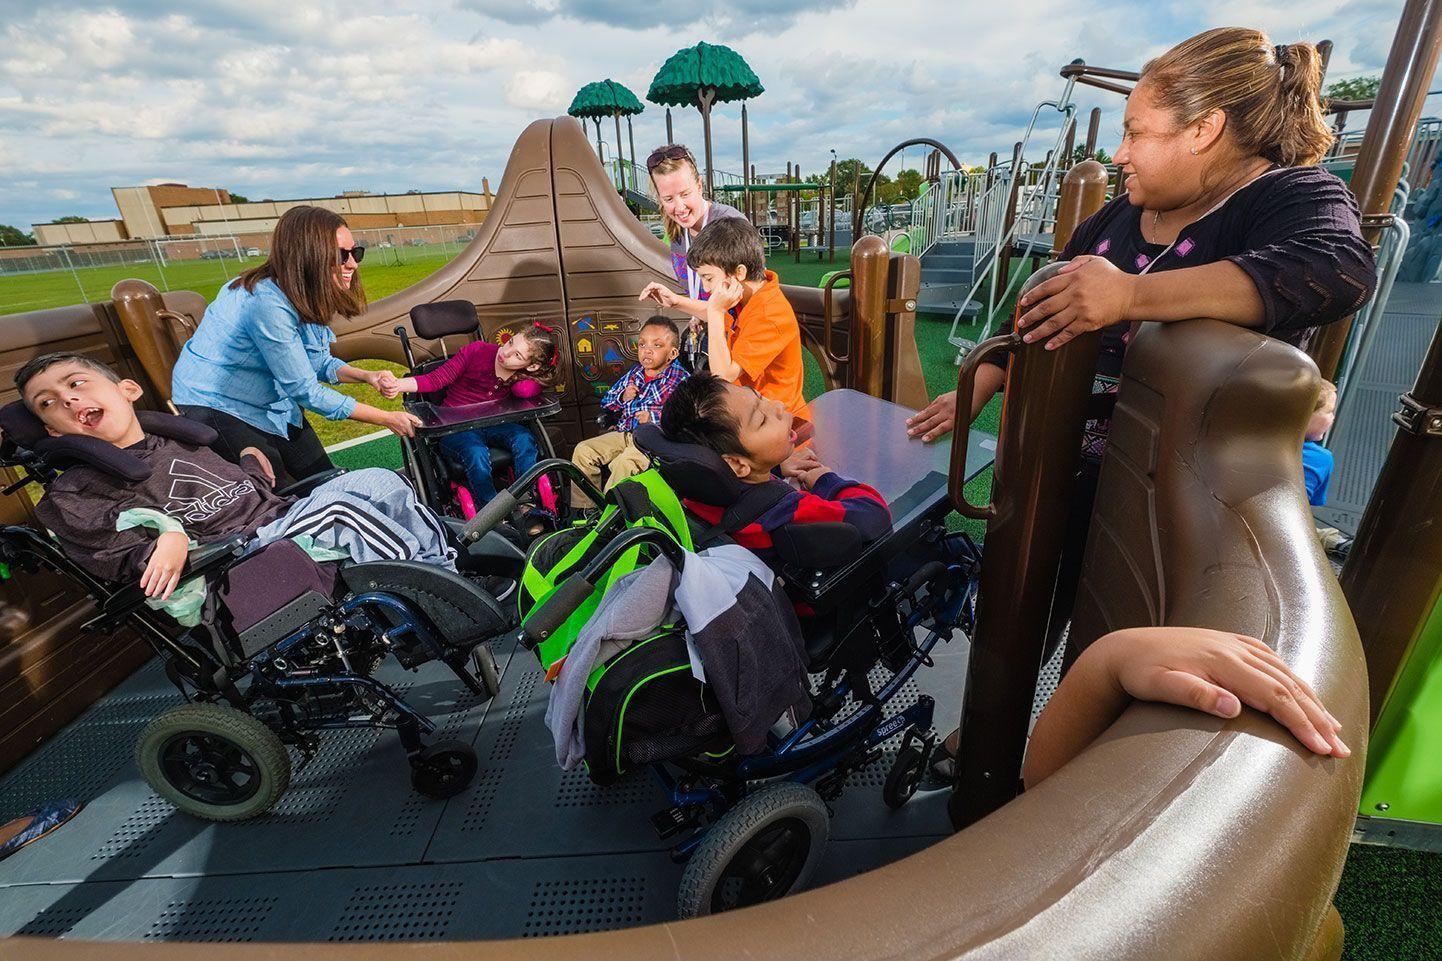 Inclusive nature based playground equipment